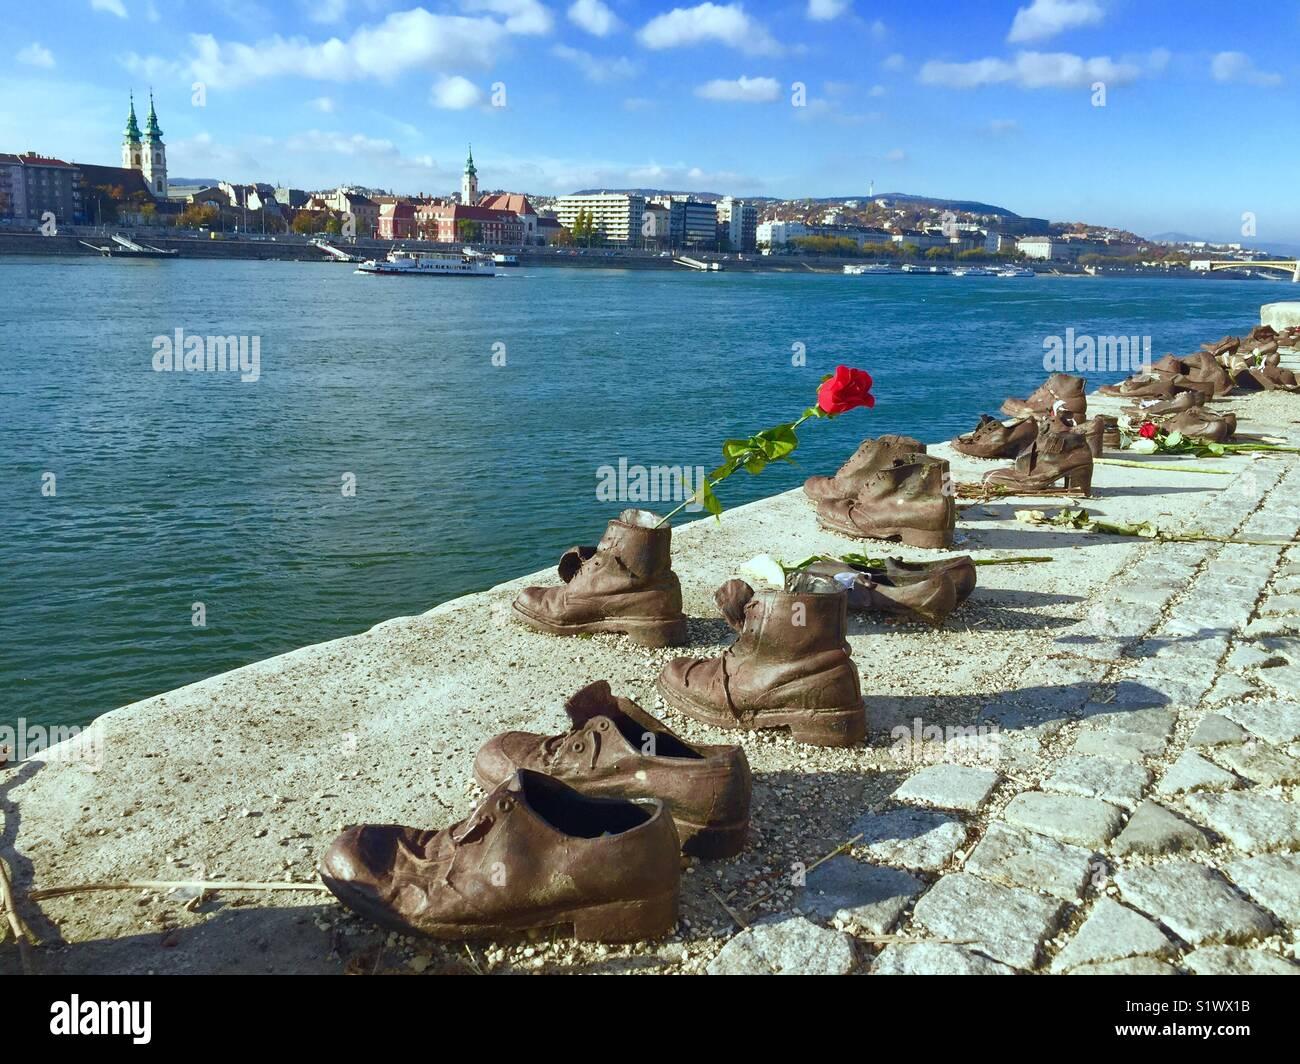 Schuhe Am Donauufer Budapest Ungarn Stockfoto Bild 310970503 Alamy